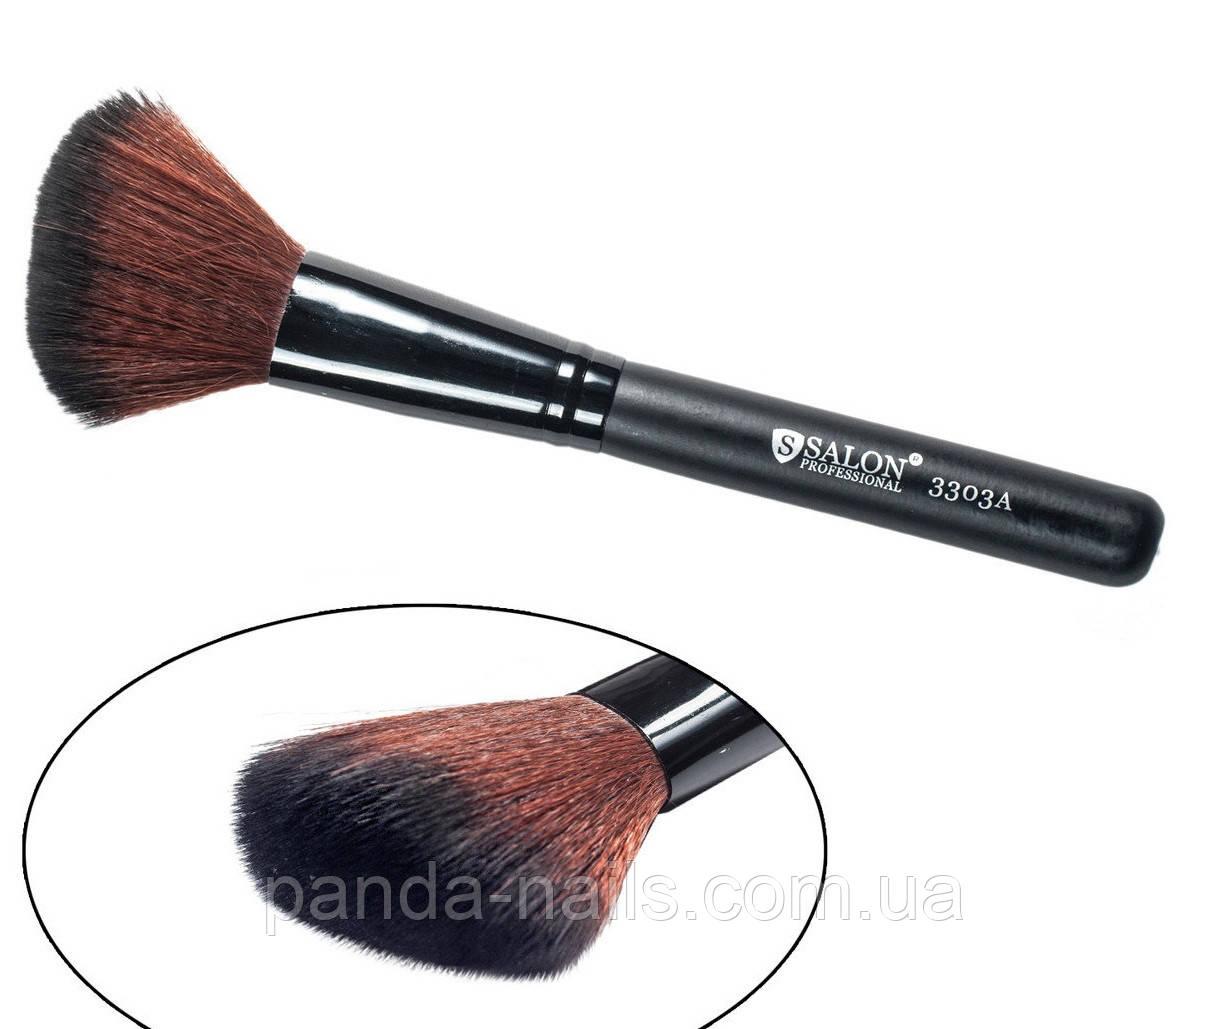 Кисть для румян Salon Professional 3303A